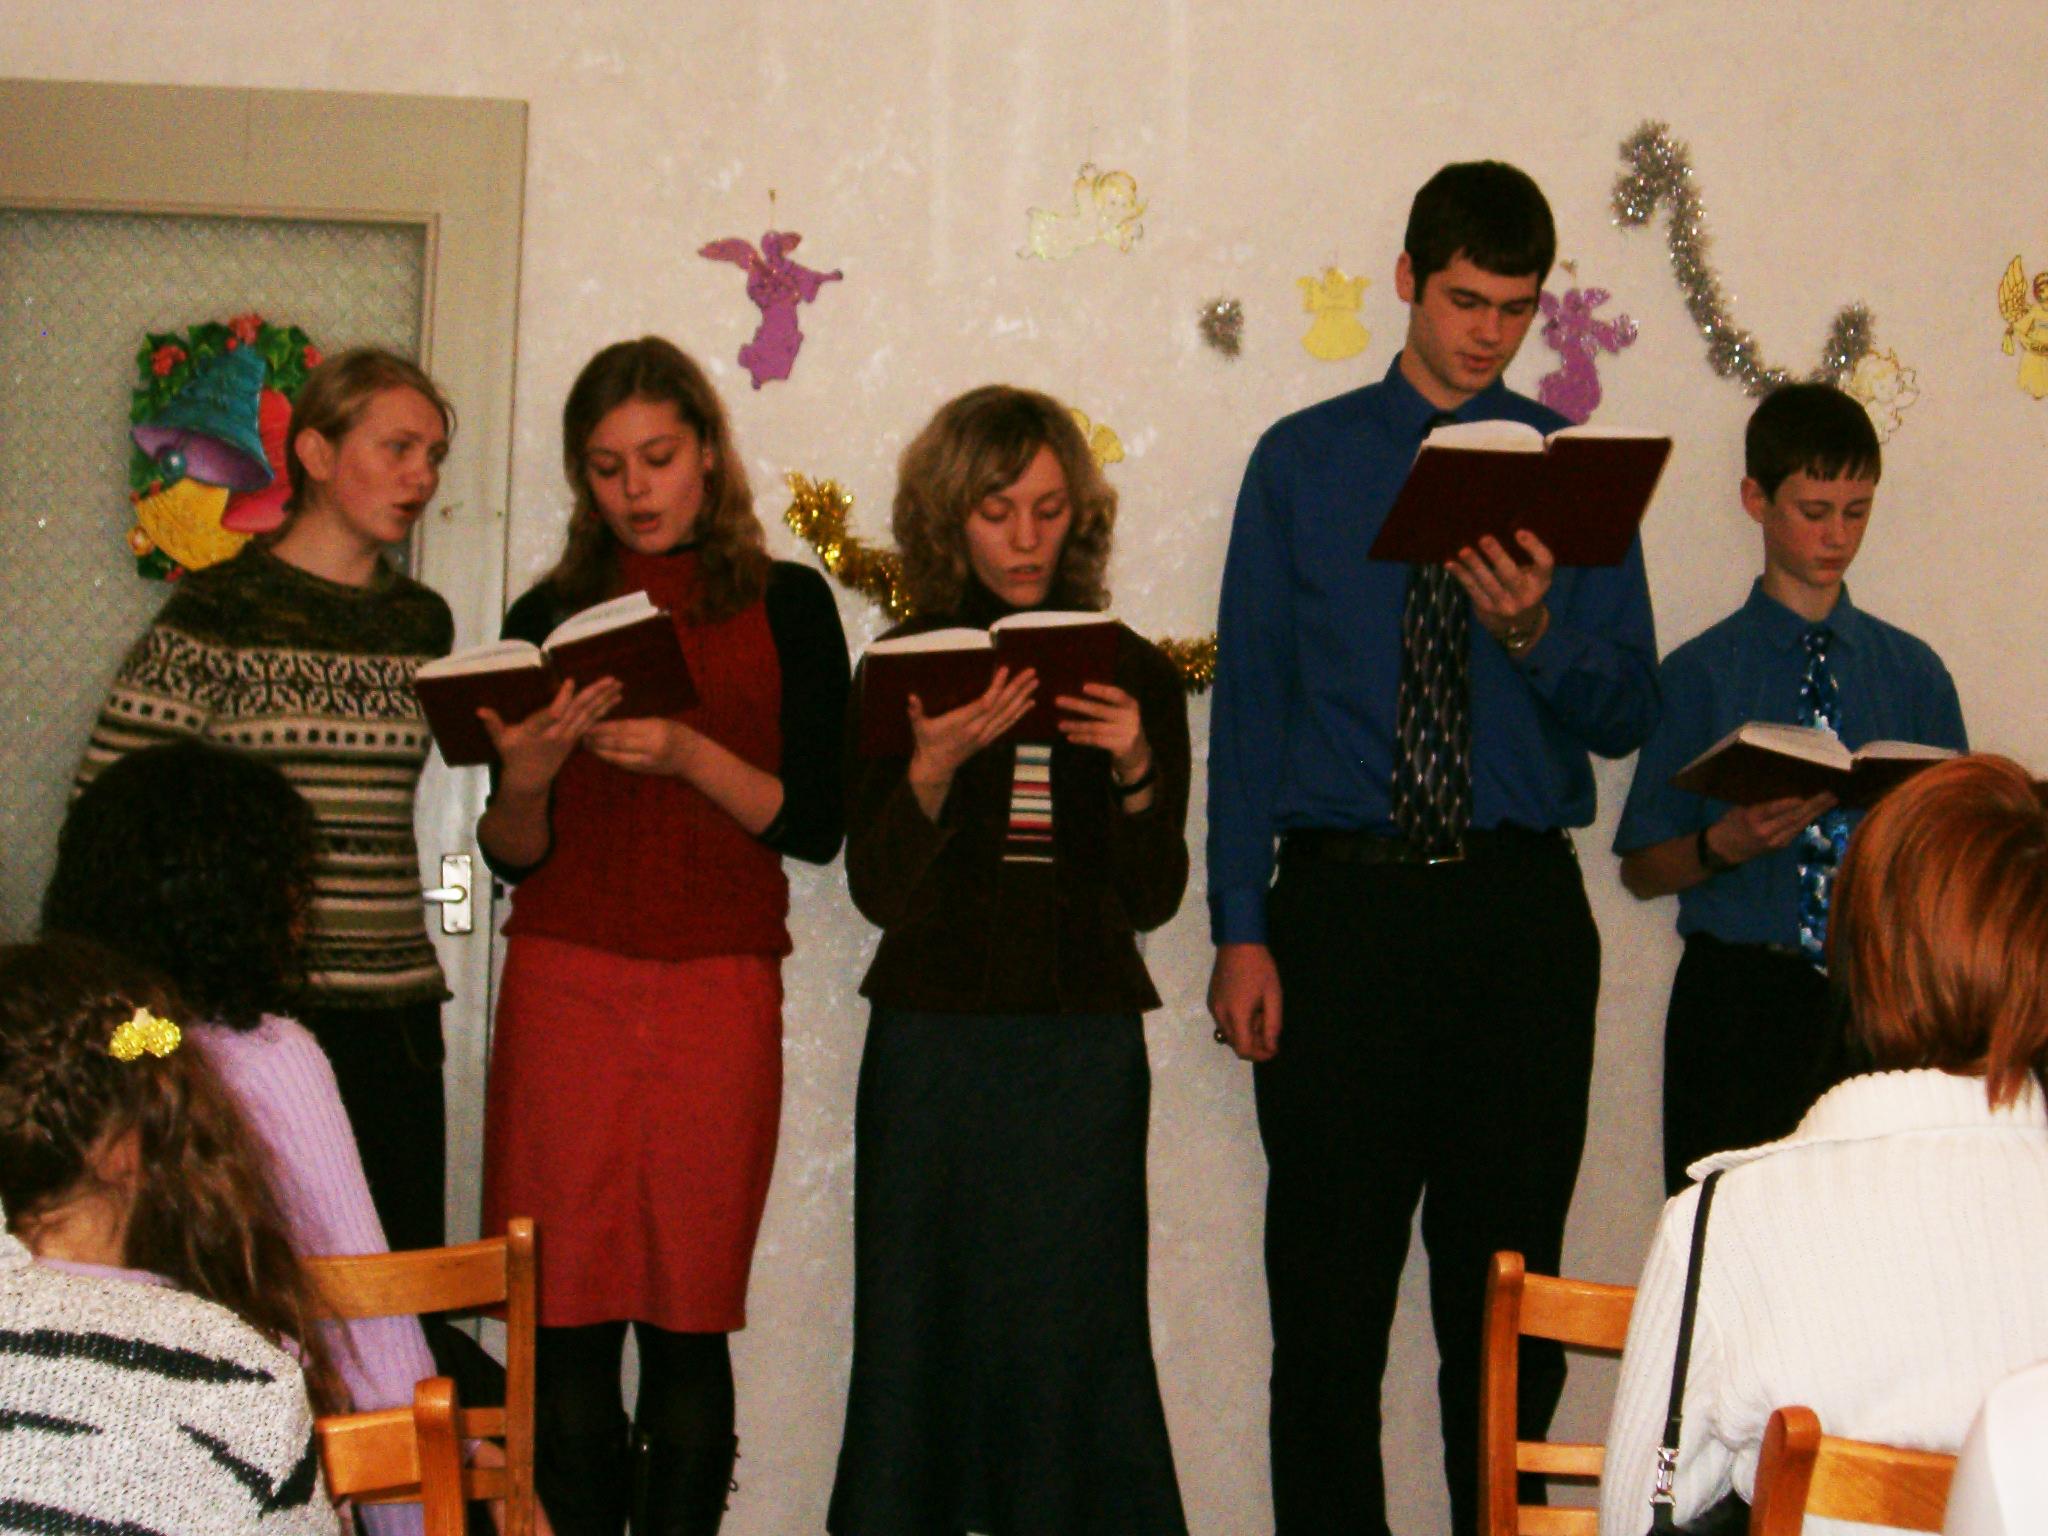 John leading songs in the local church in Belarus.